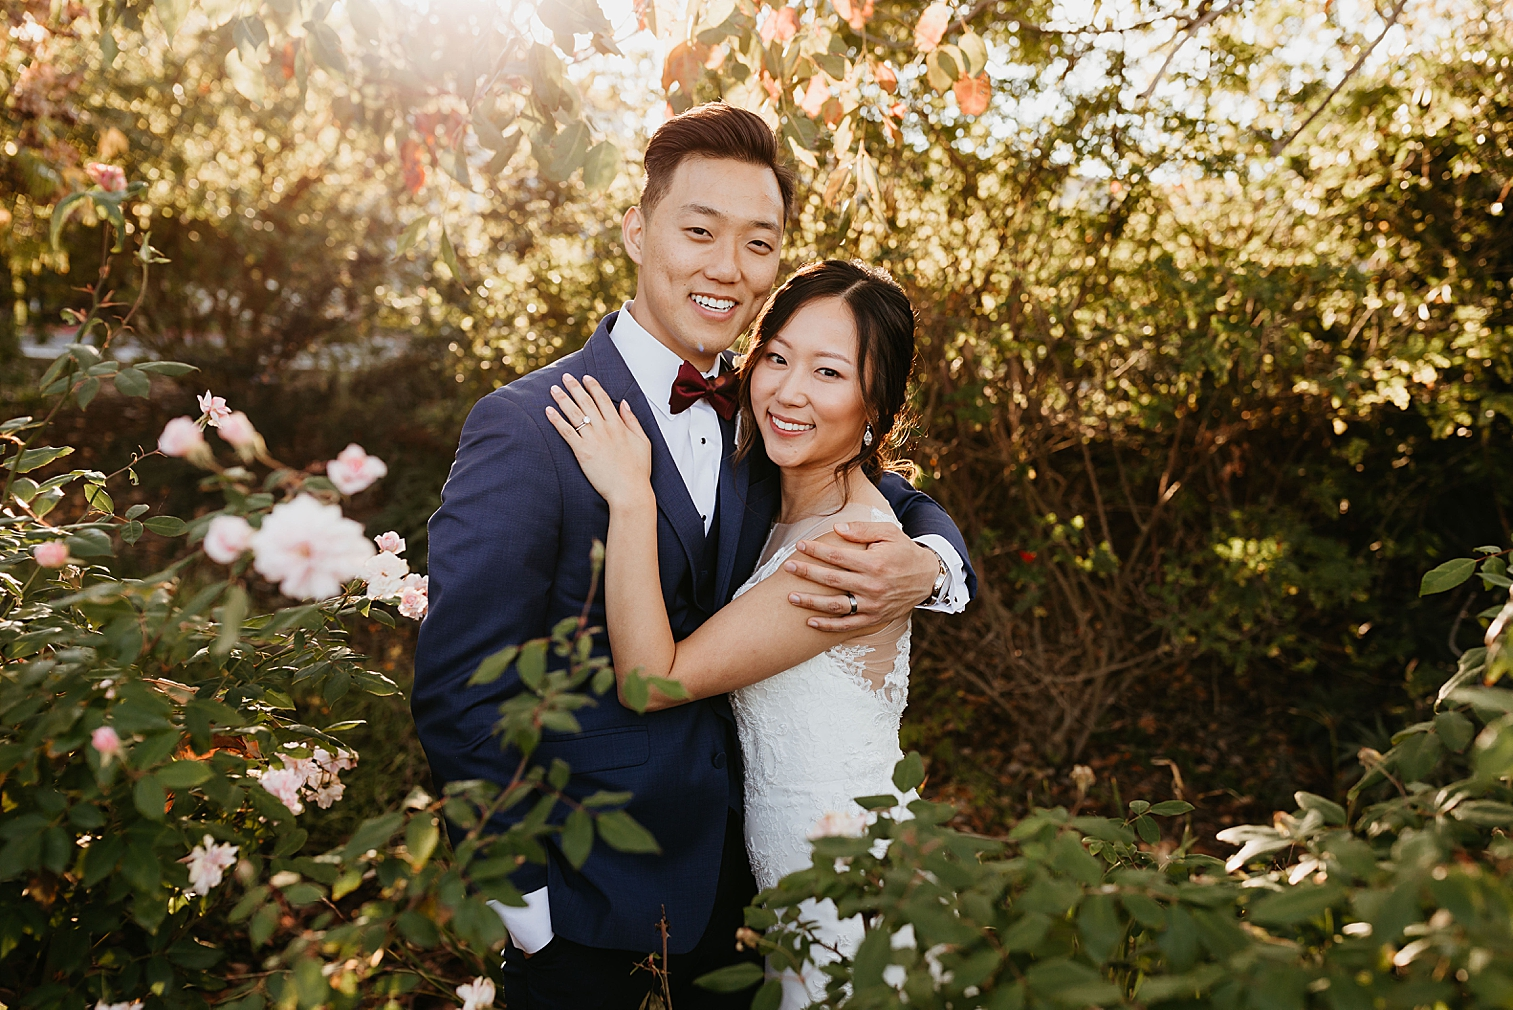 Secret-Garden-Rancho-Santa-Fe-Wedding-83.jpg